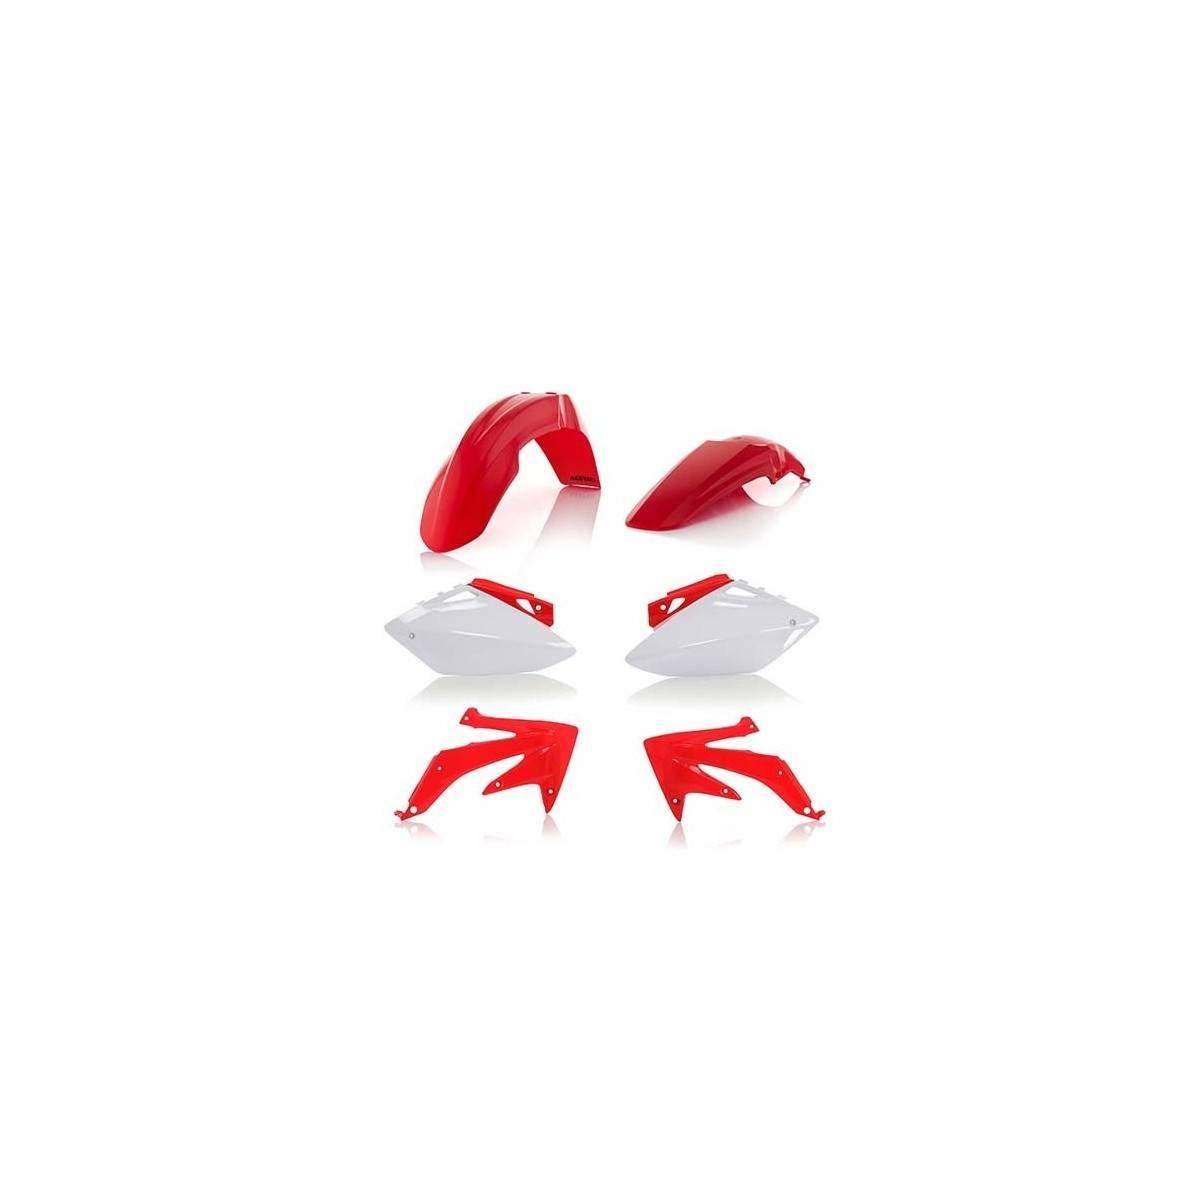 0008128-553 - Kit Plasticos Acerbis Crf 450 05 06 Origen